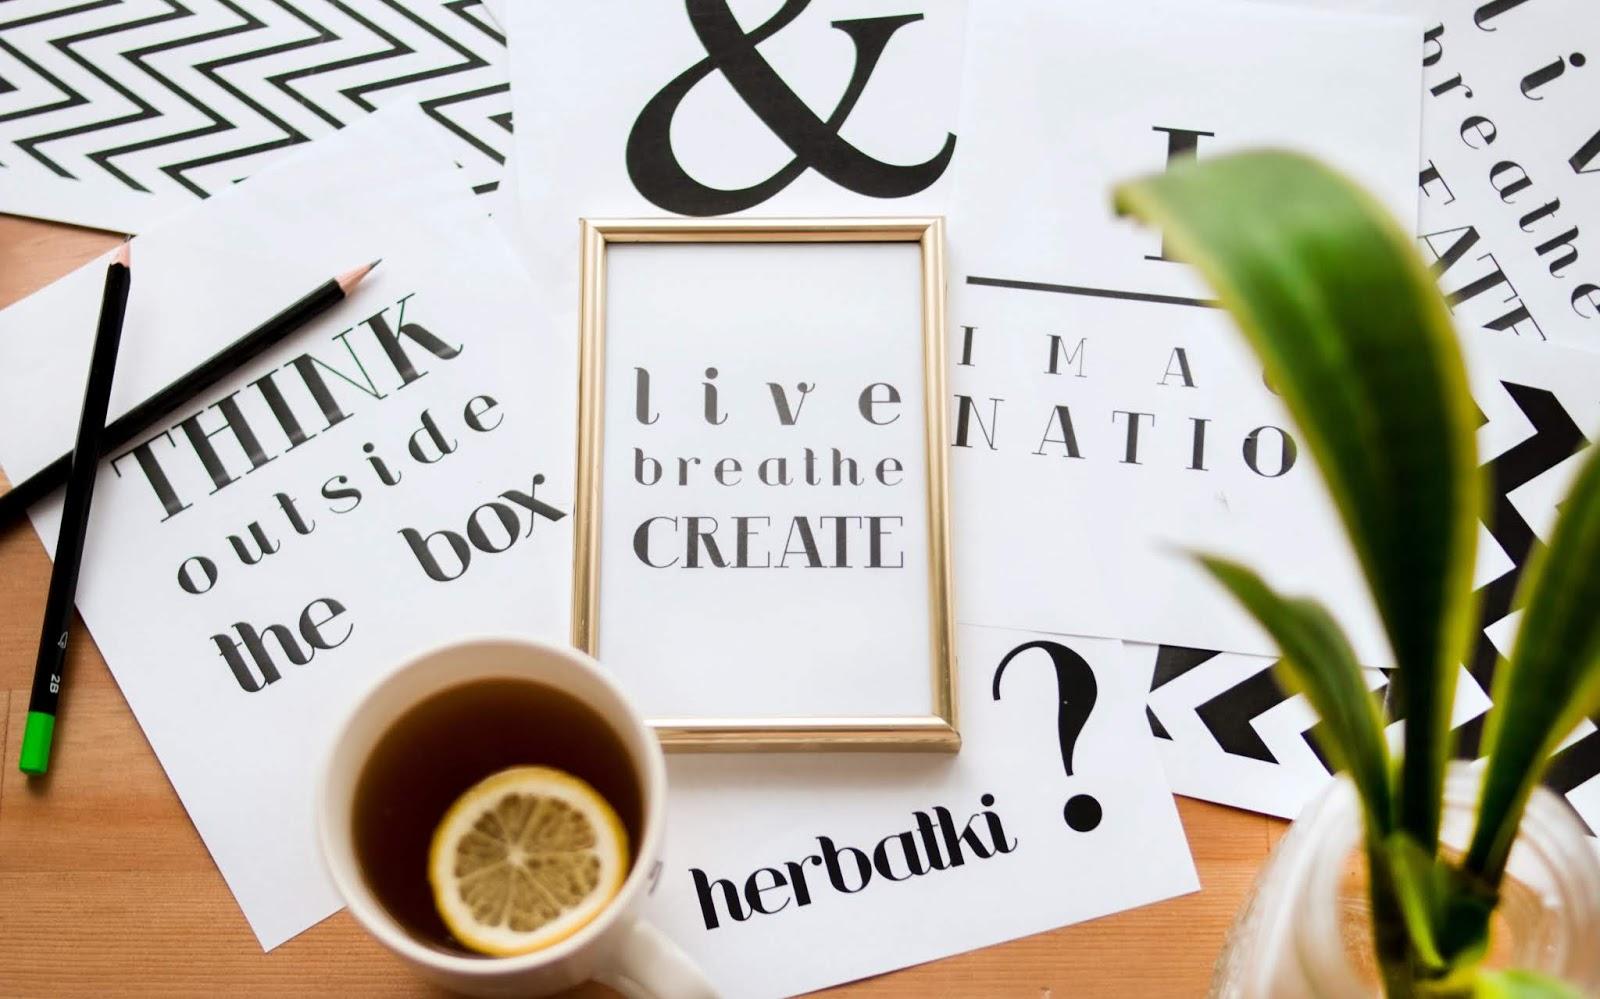 herbatka kreatywna: live, breathe, create